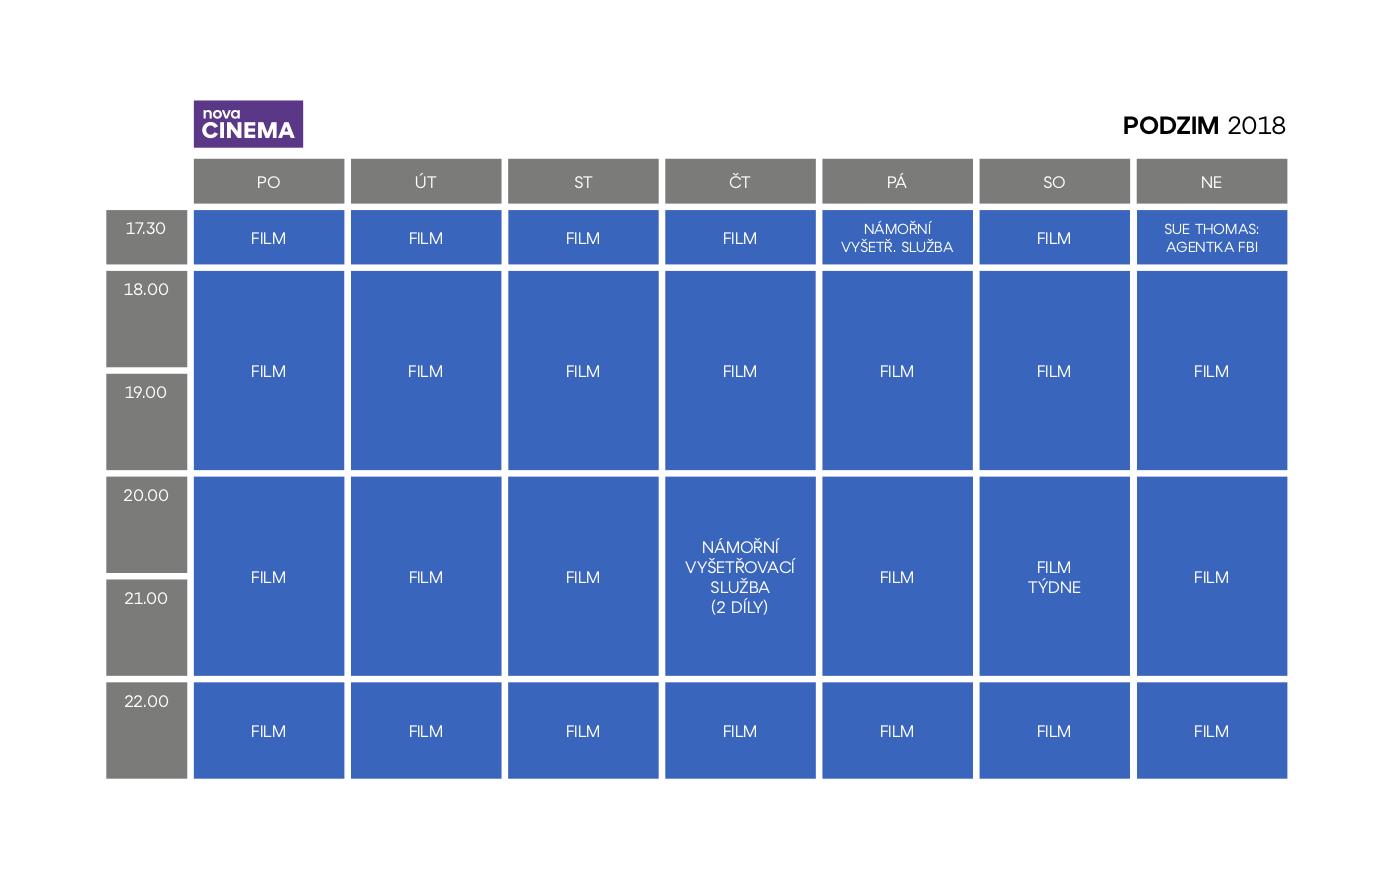 Programové schéma kanálu Nova Cinema, podzim 2018